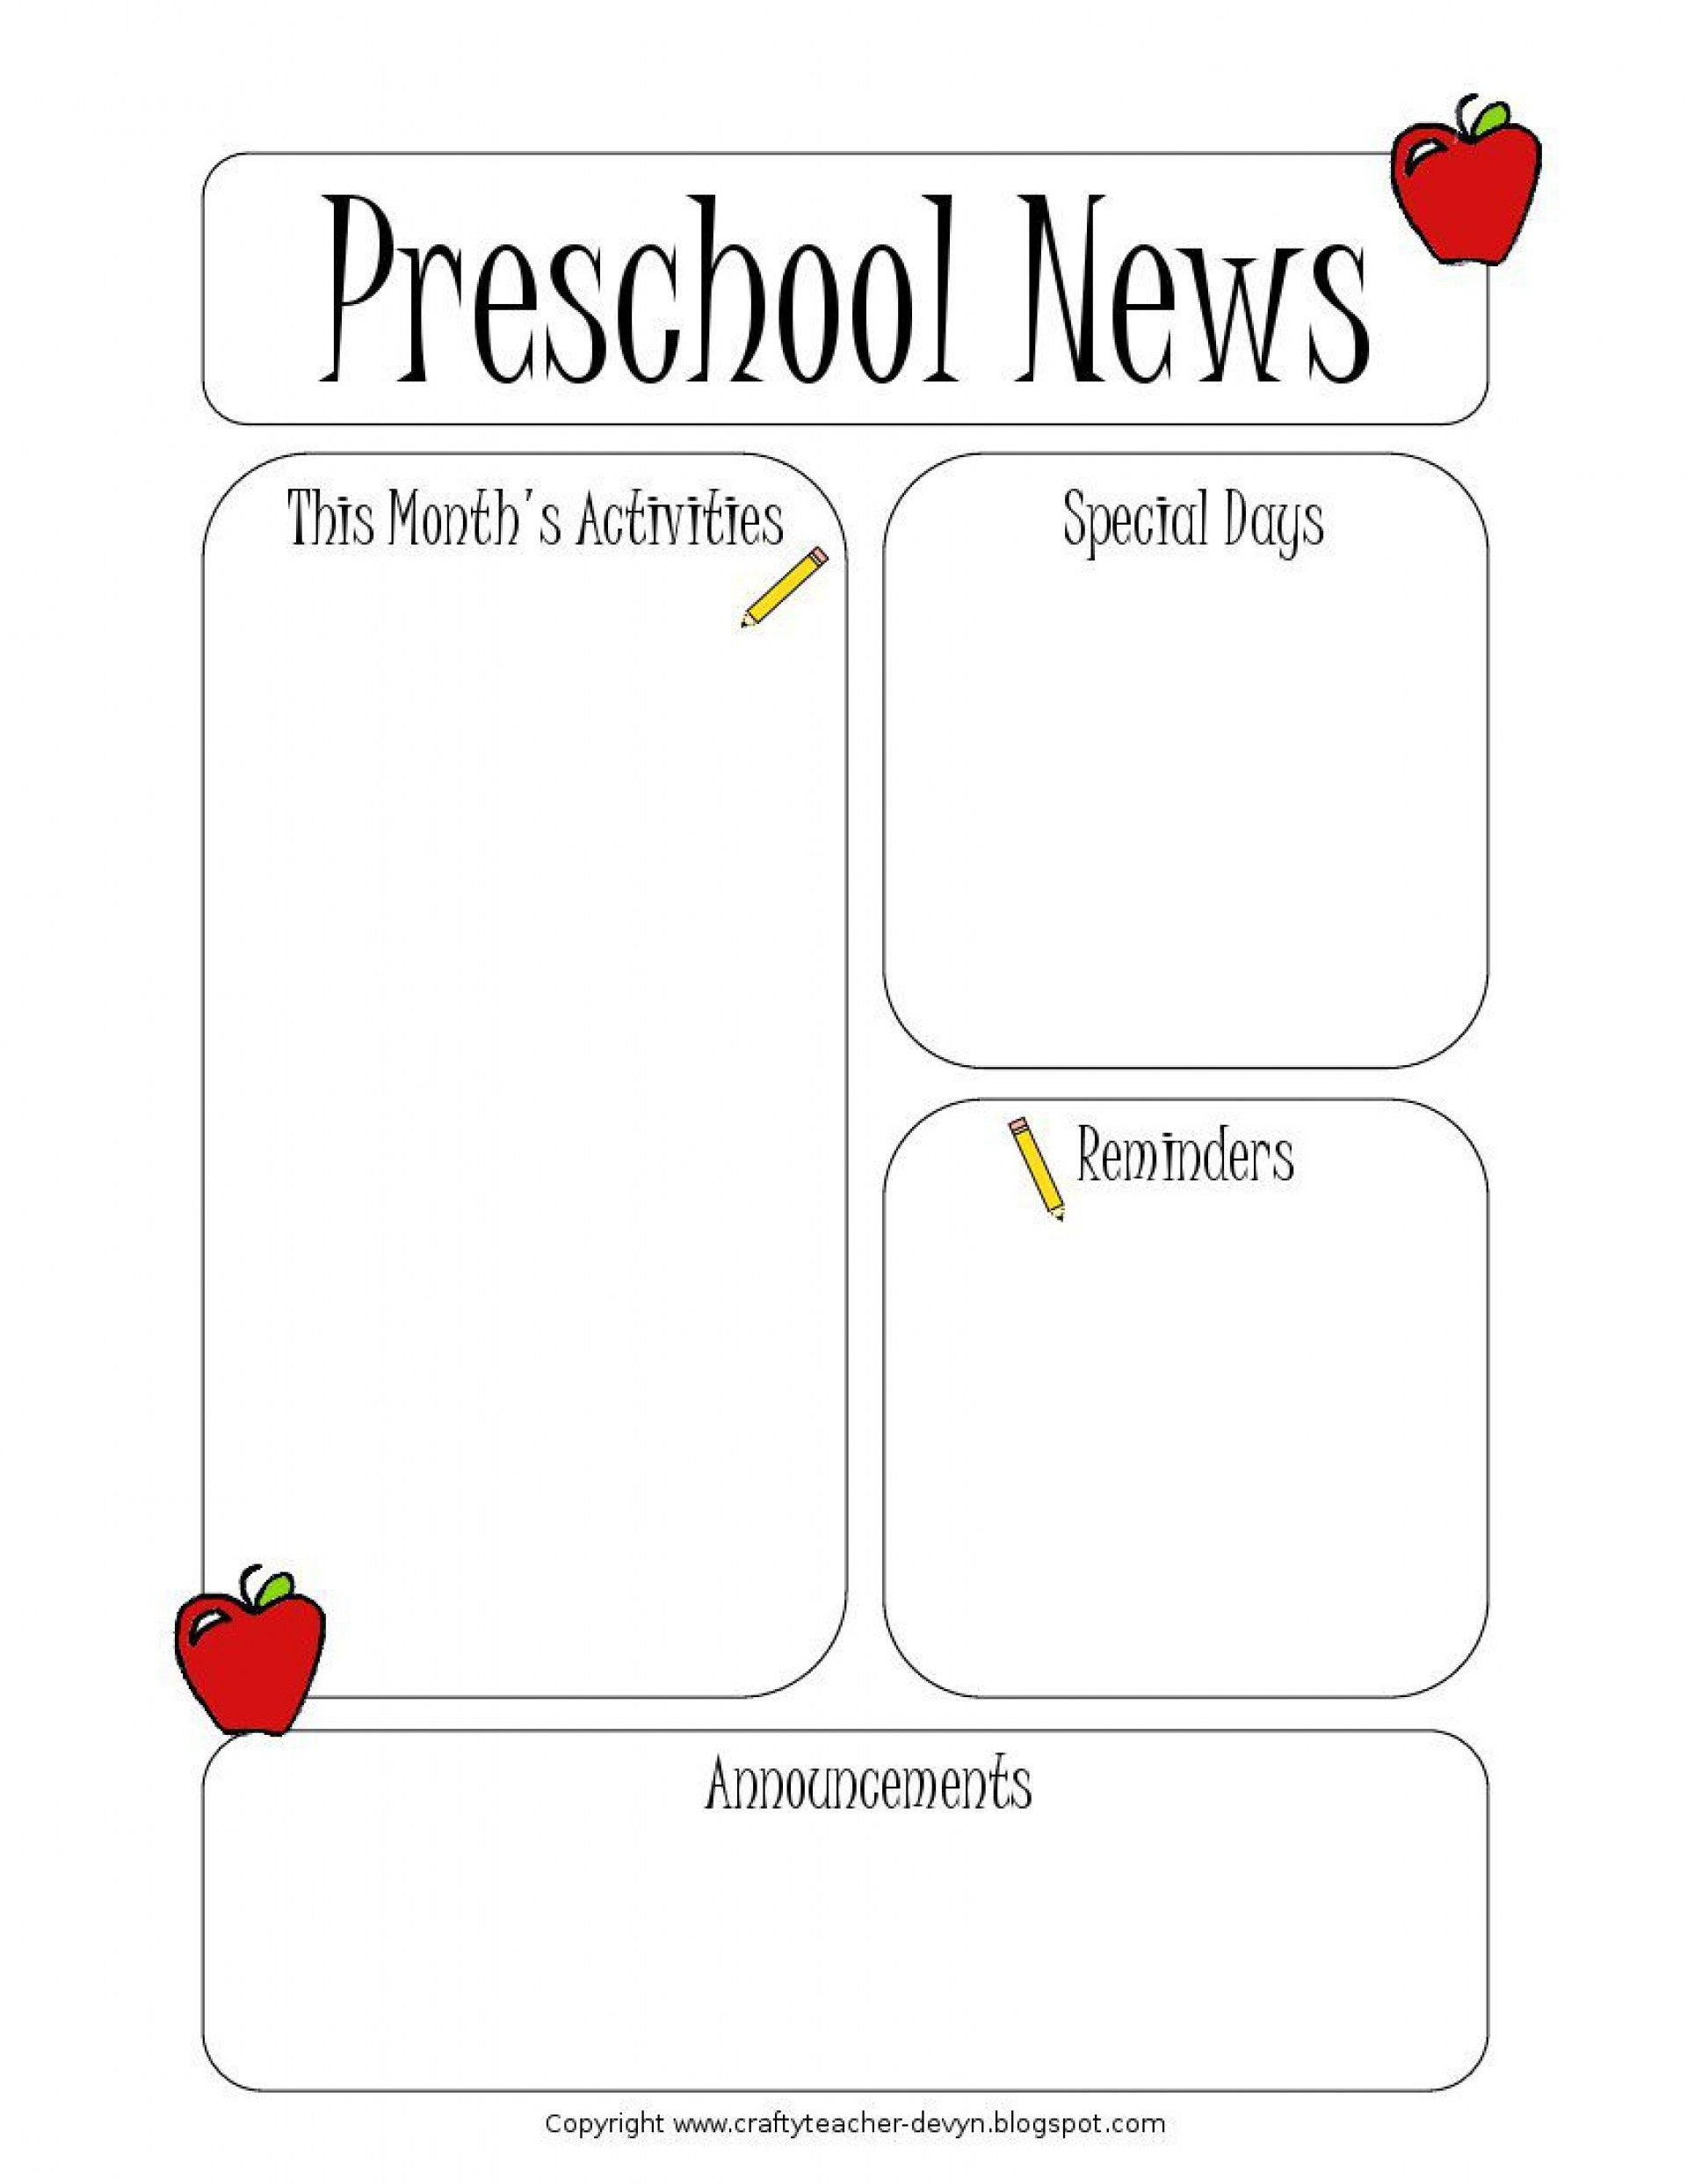 005 Wondrou Newsletter Template For Teacher Inspiration  Teachers To Parent Printable Free School1920